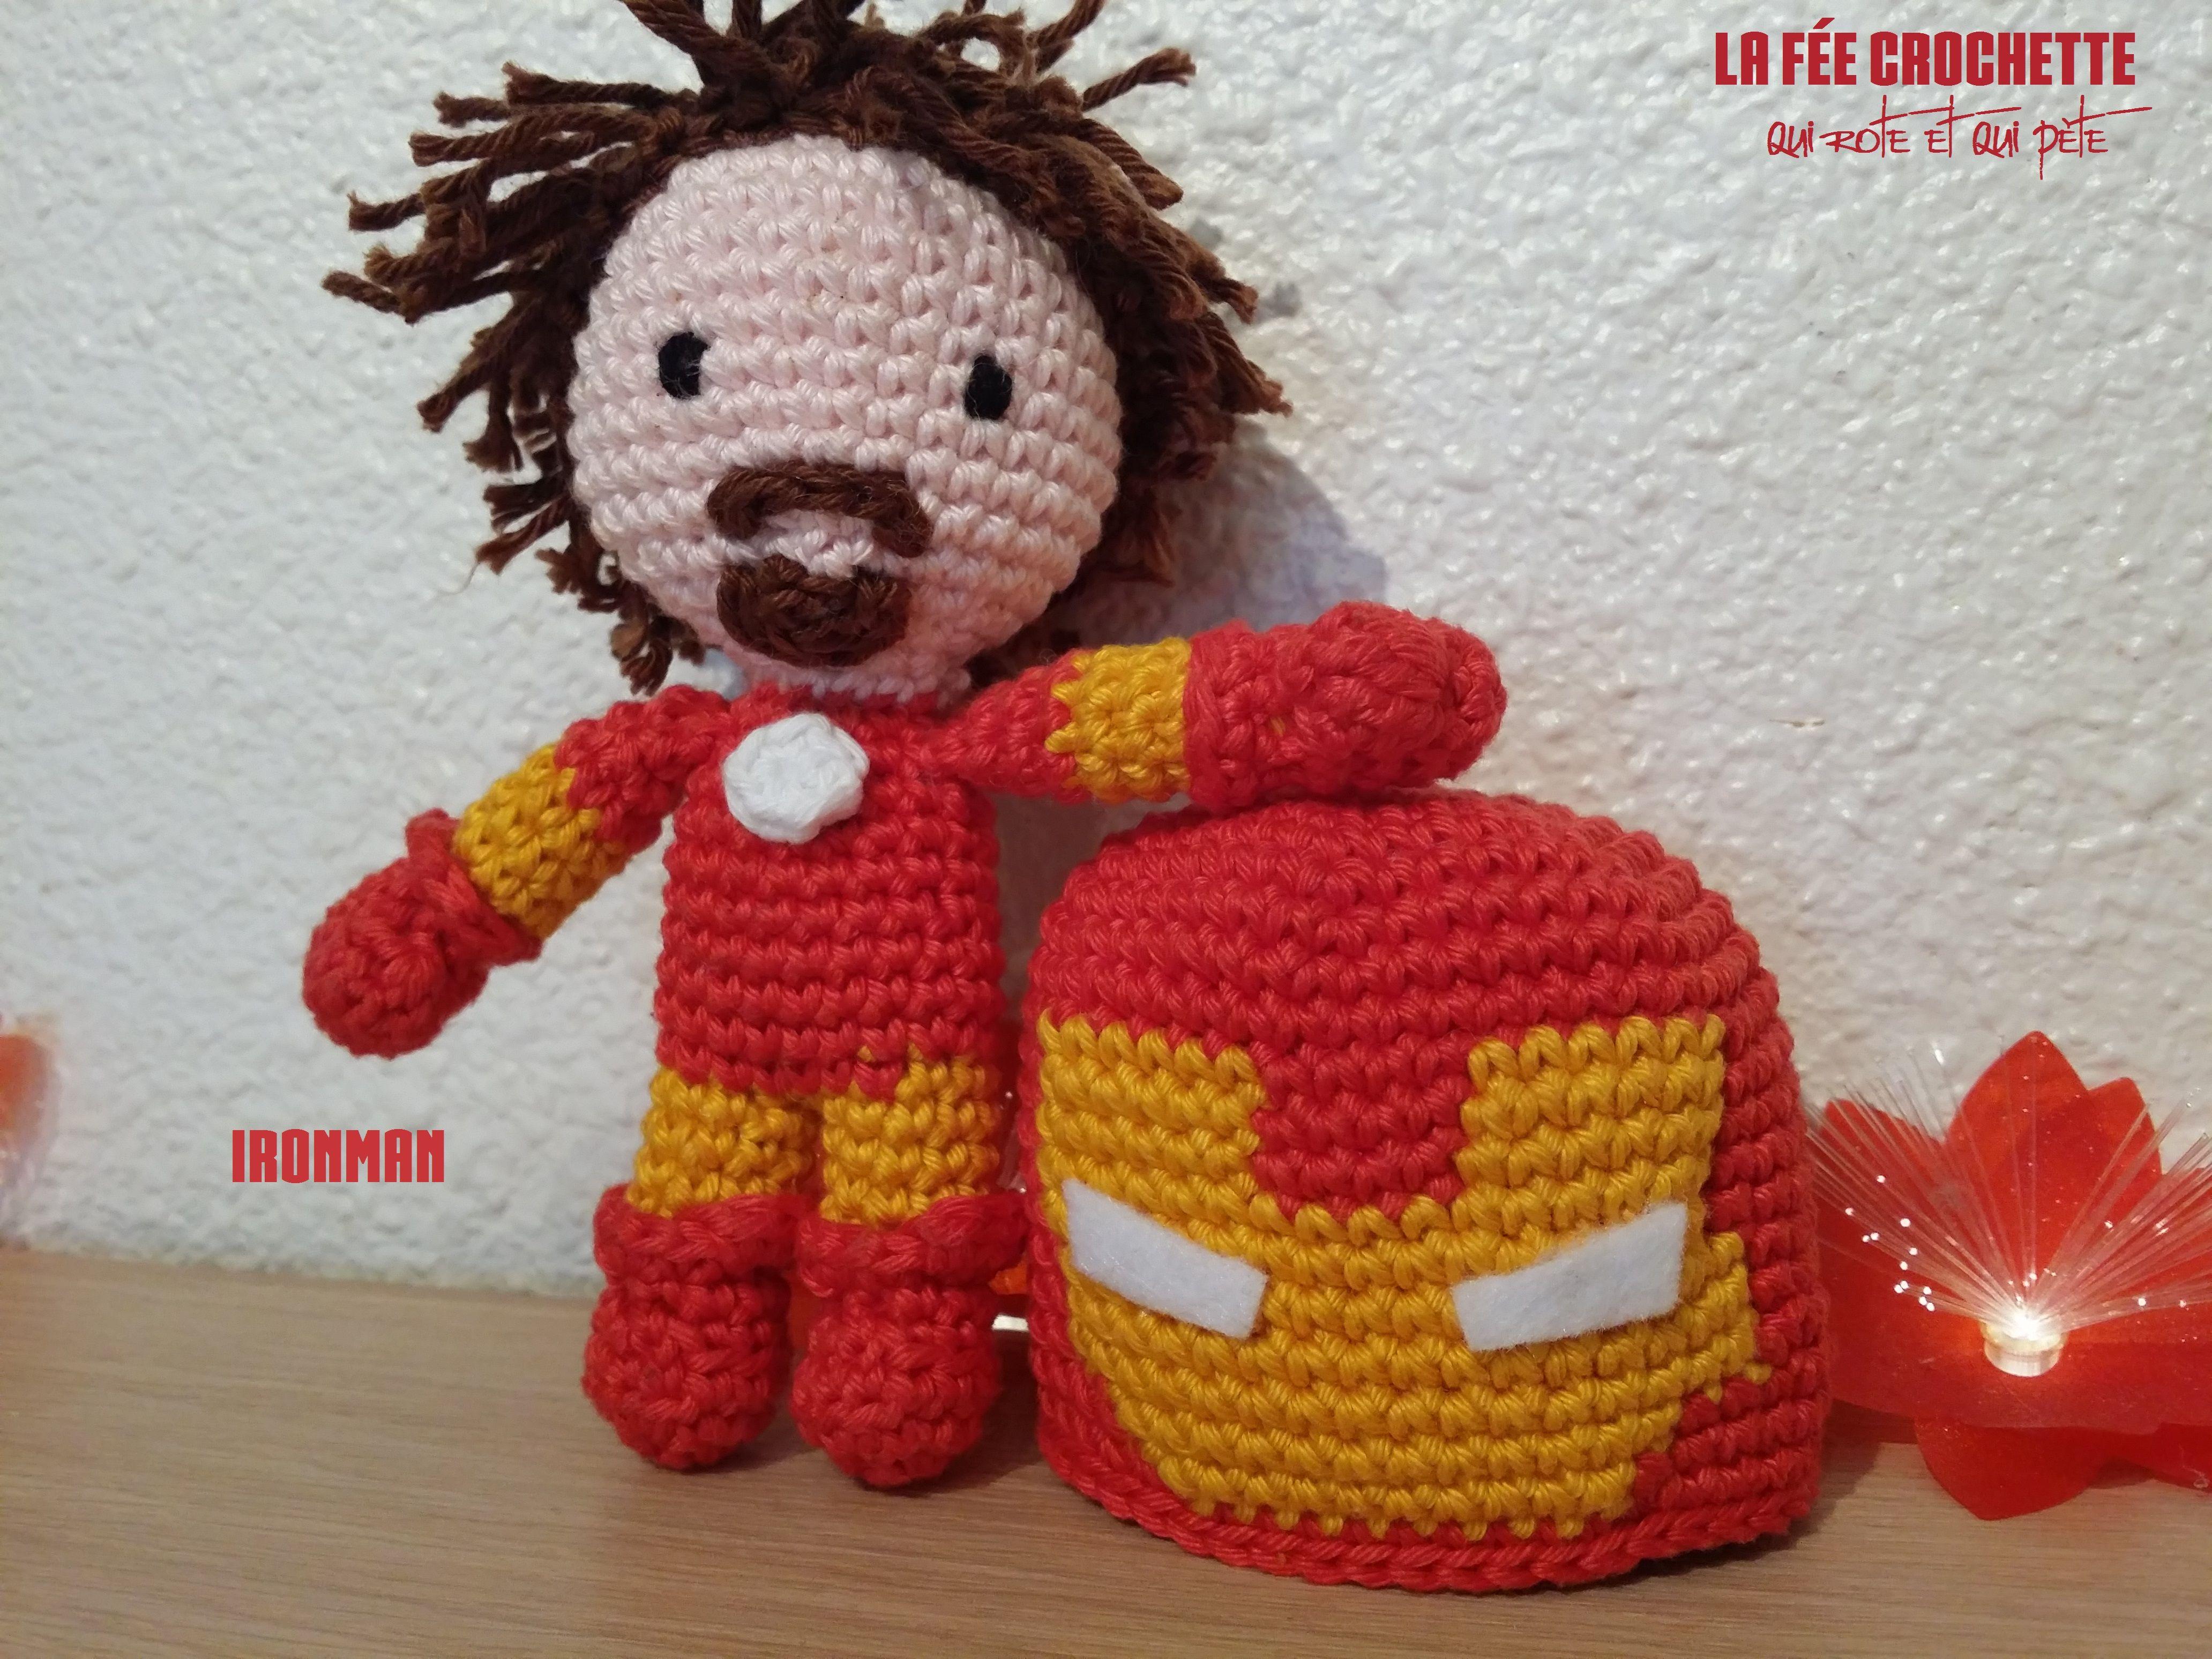 daxa rabalea: Iron Man amigurumi - patrón gratis | 3096x4128